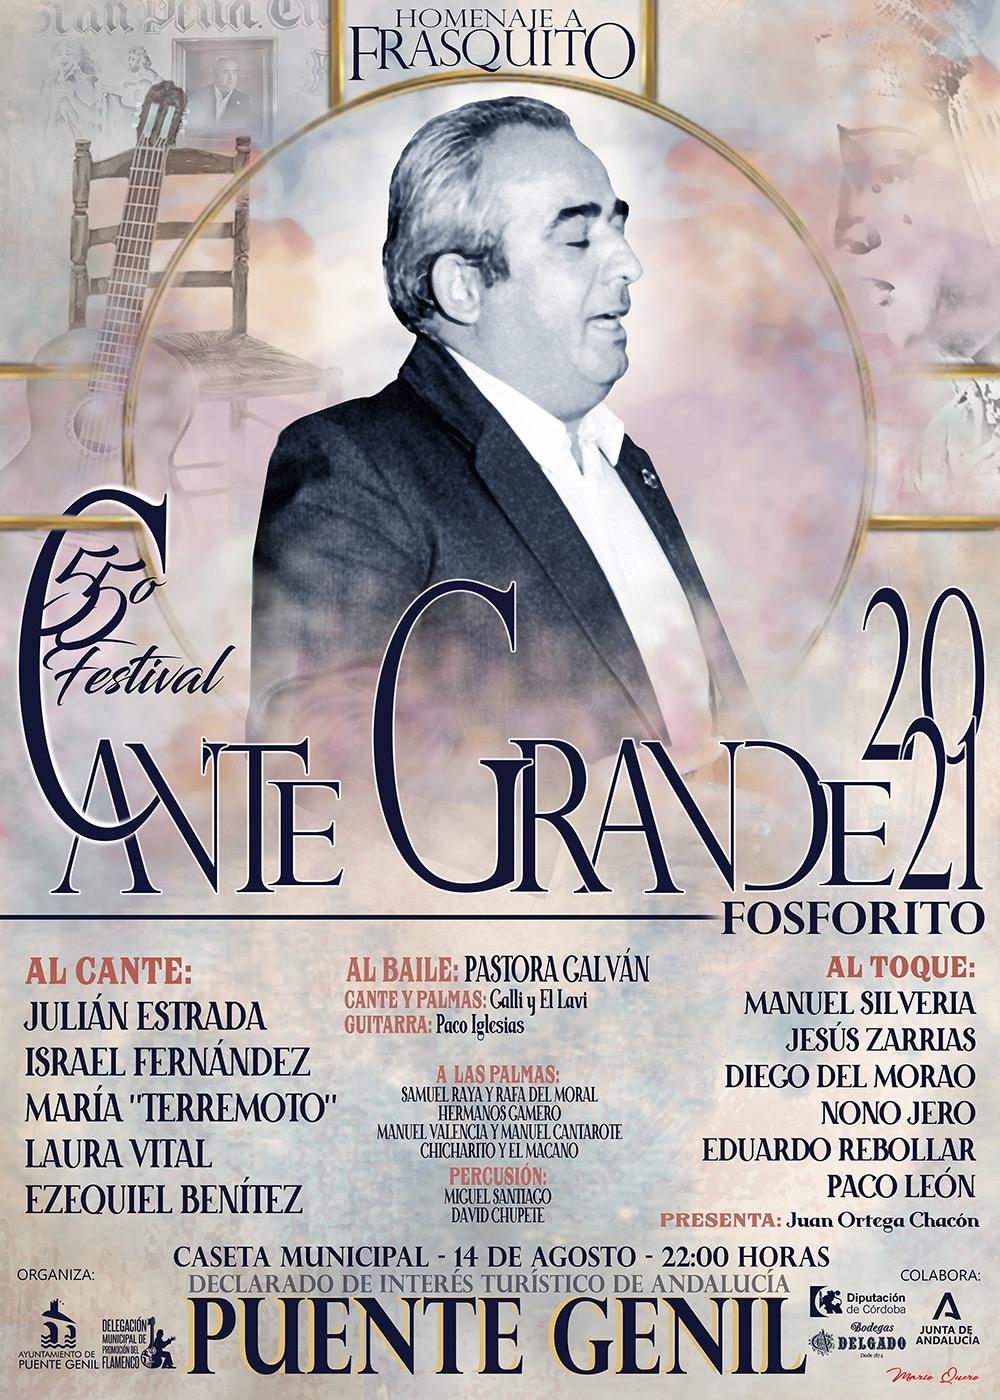 Puente Genil - Festival de Cante Jondo